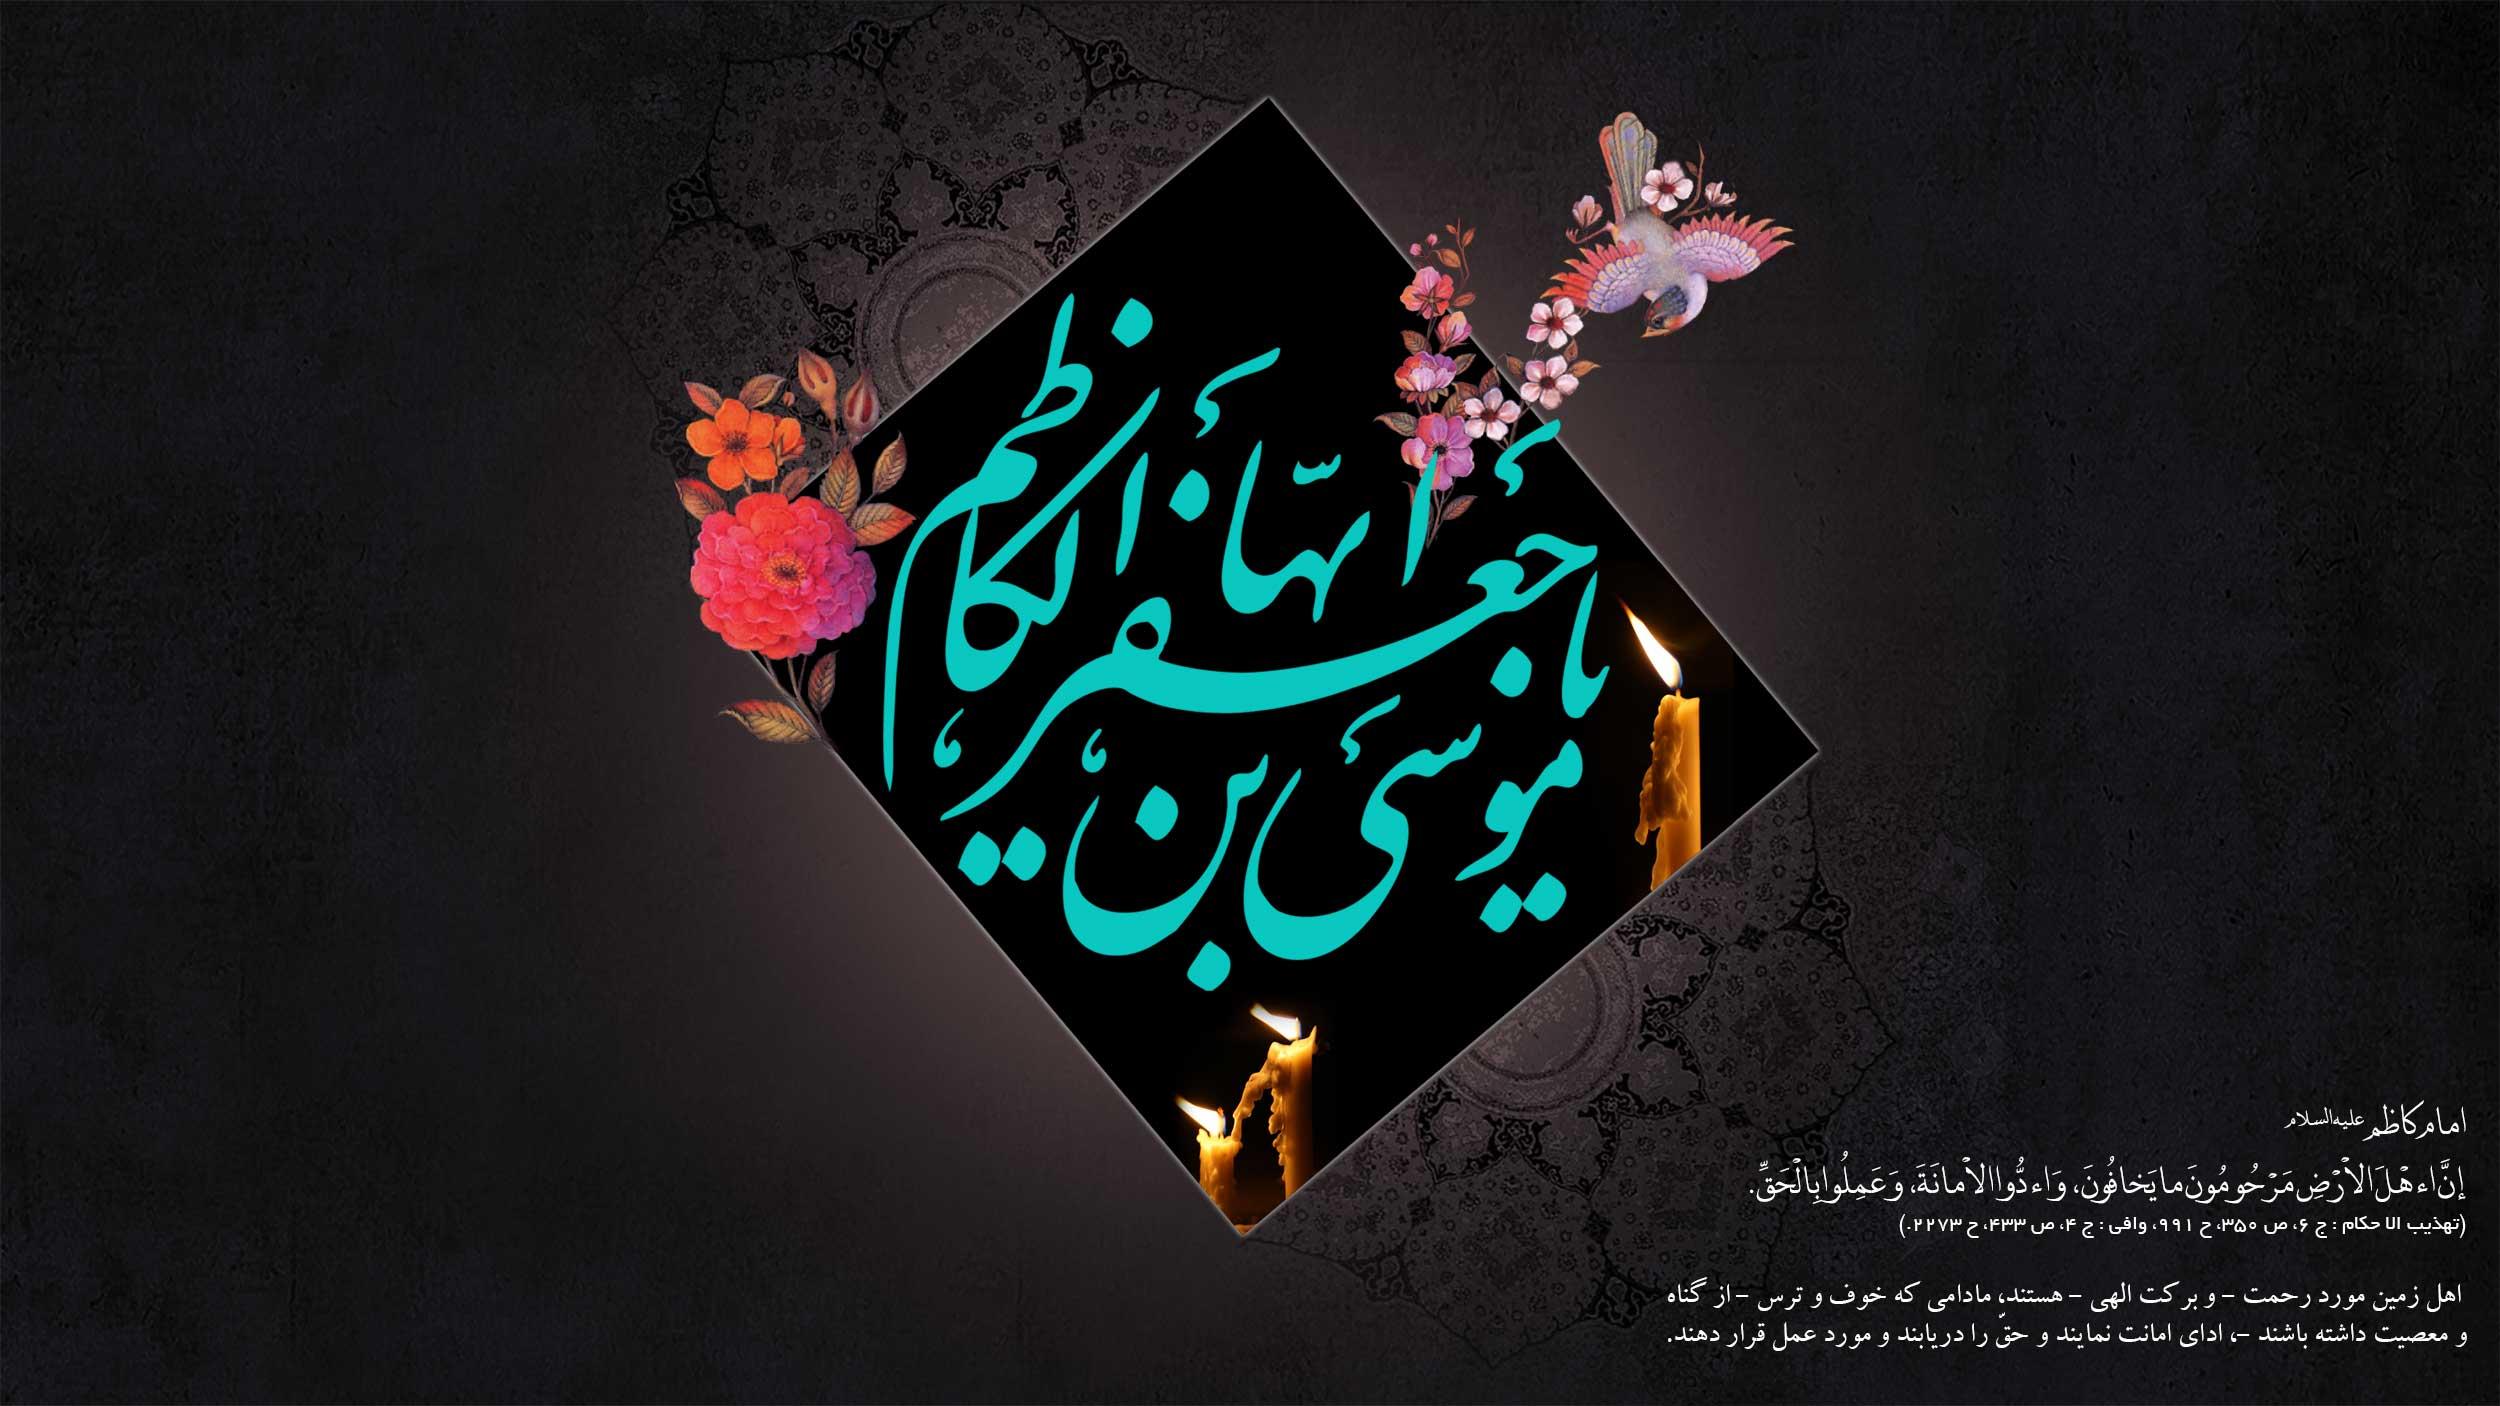 شهادت امام کاظم - بشیران